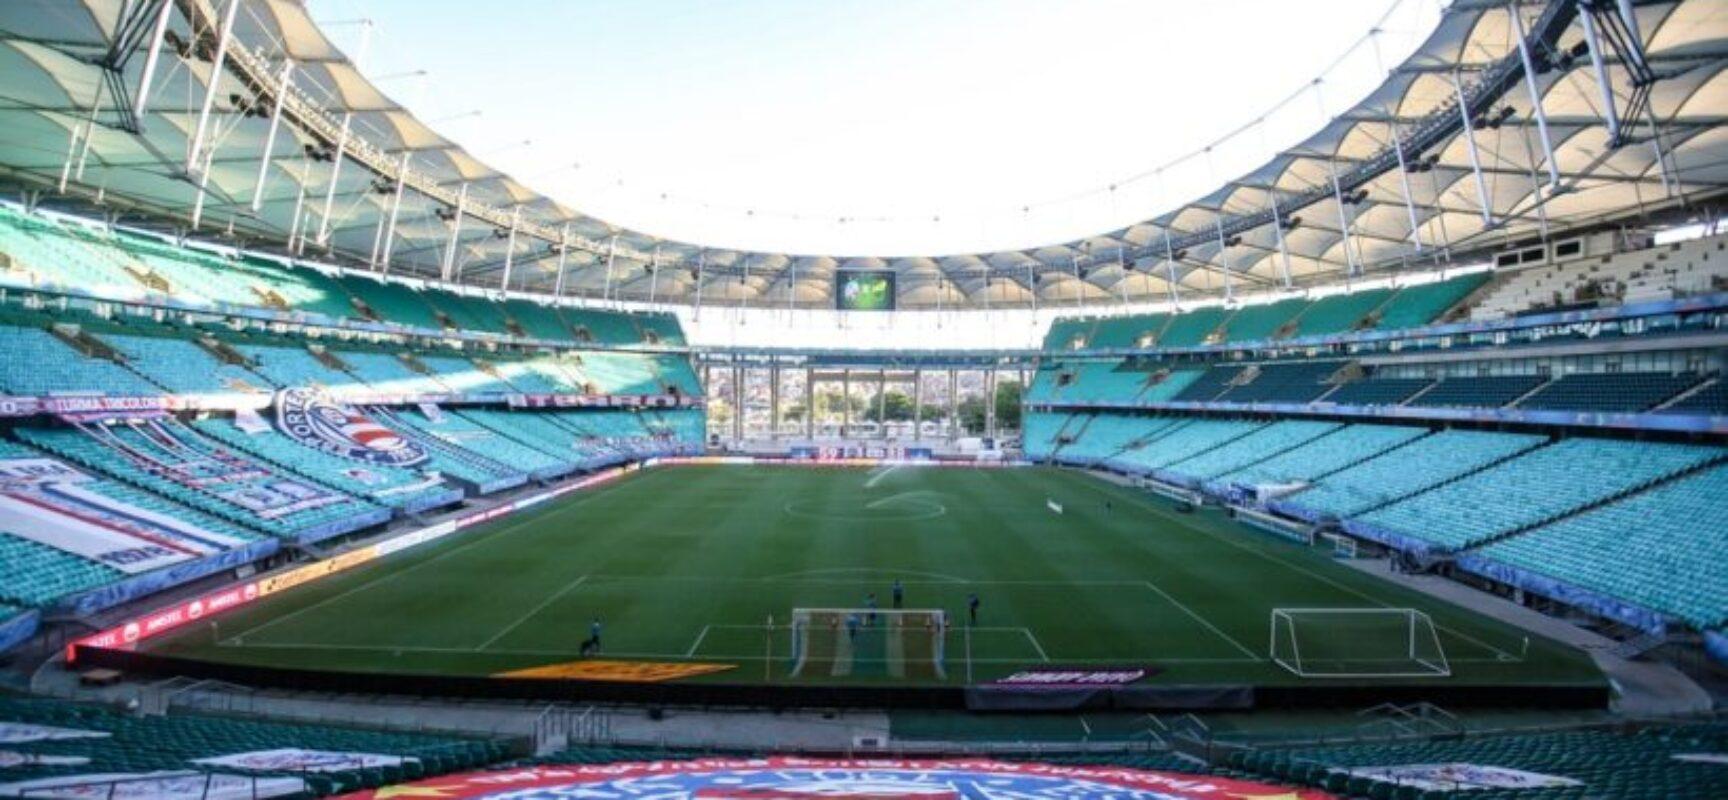 Bahia retorna à Fonte Nova no próximo sábado (18)